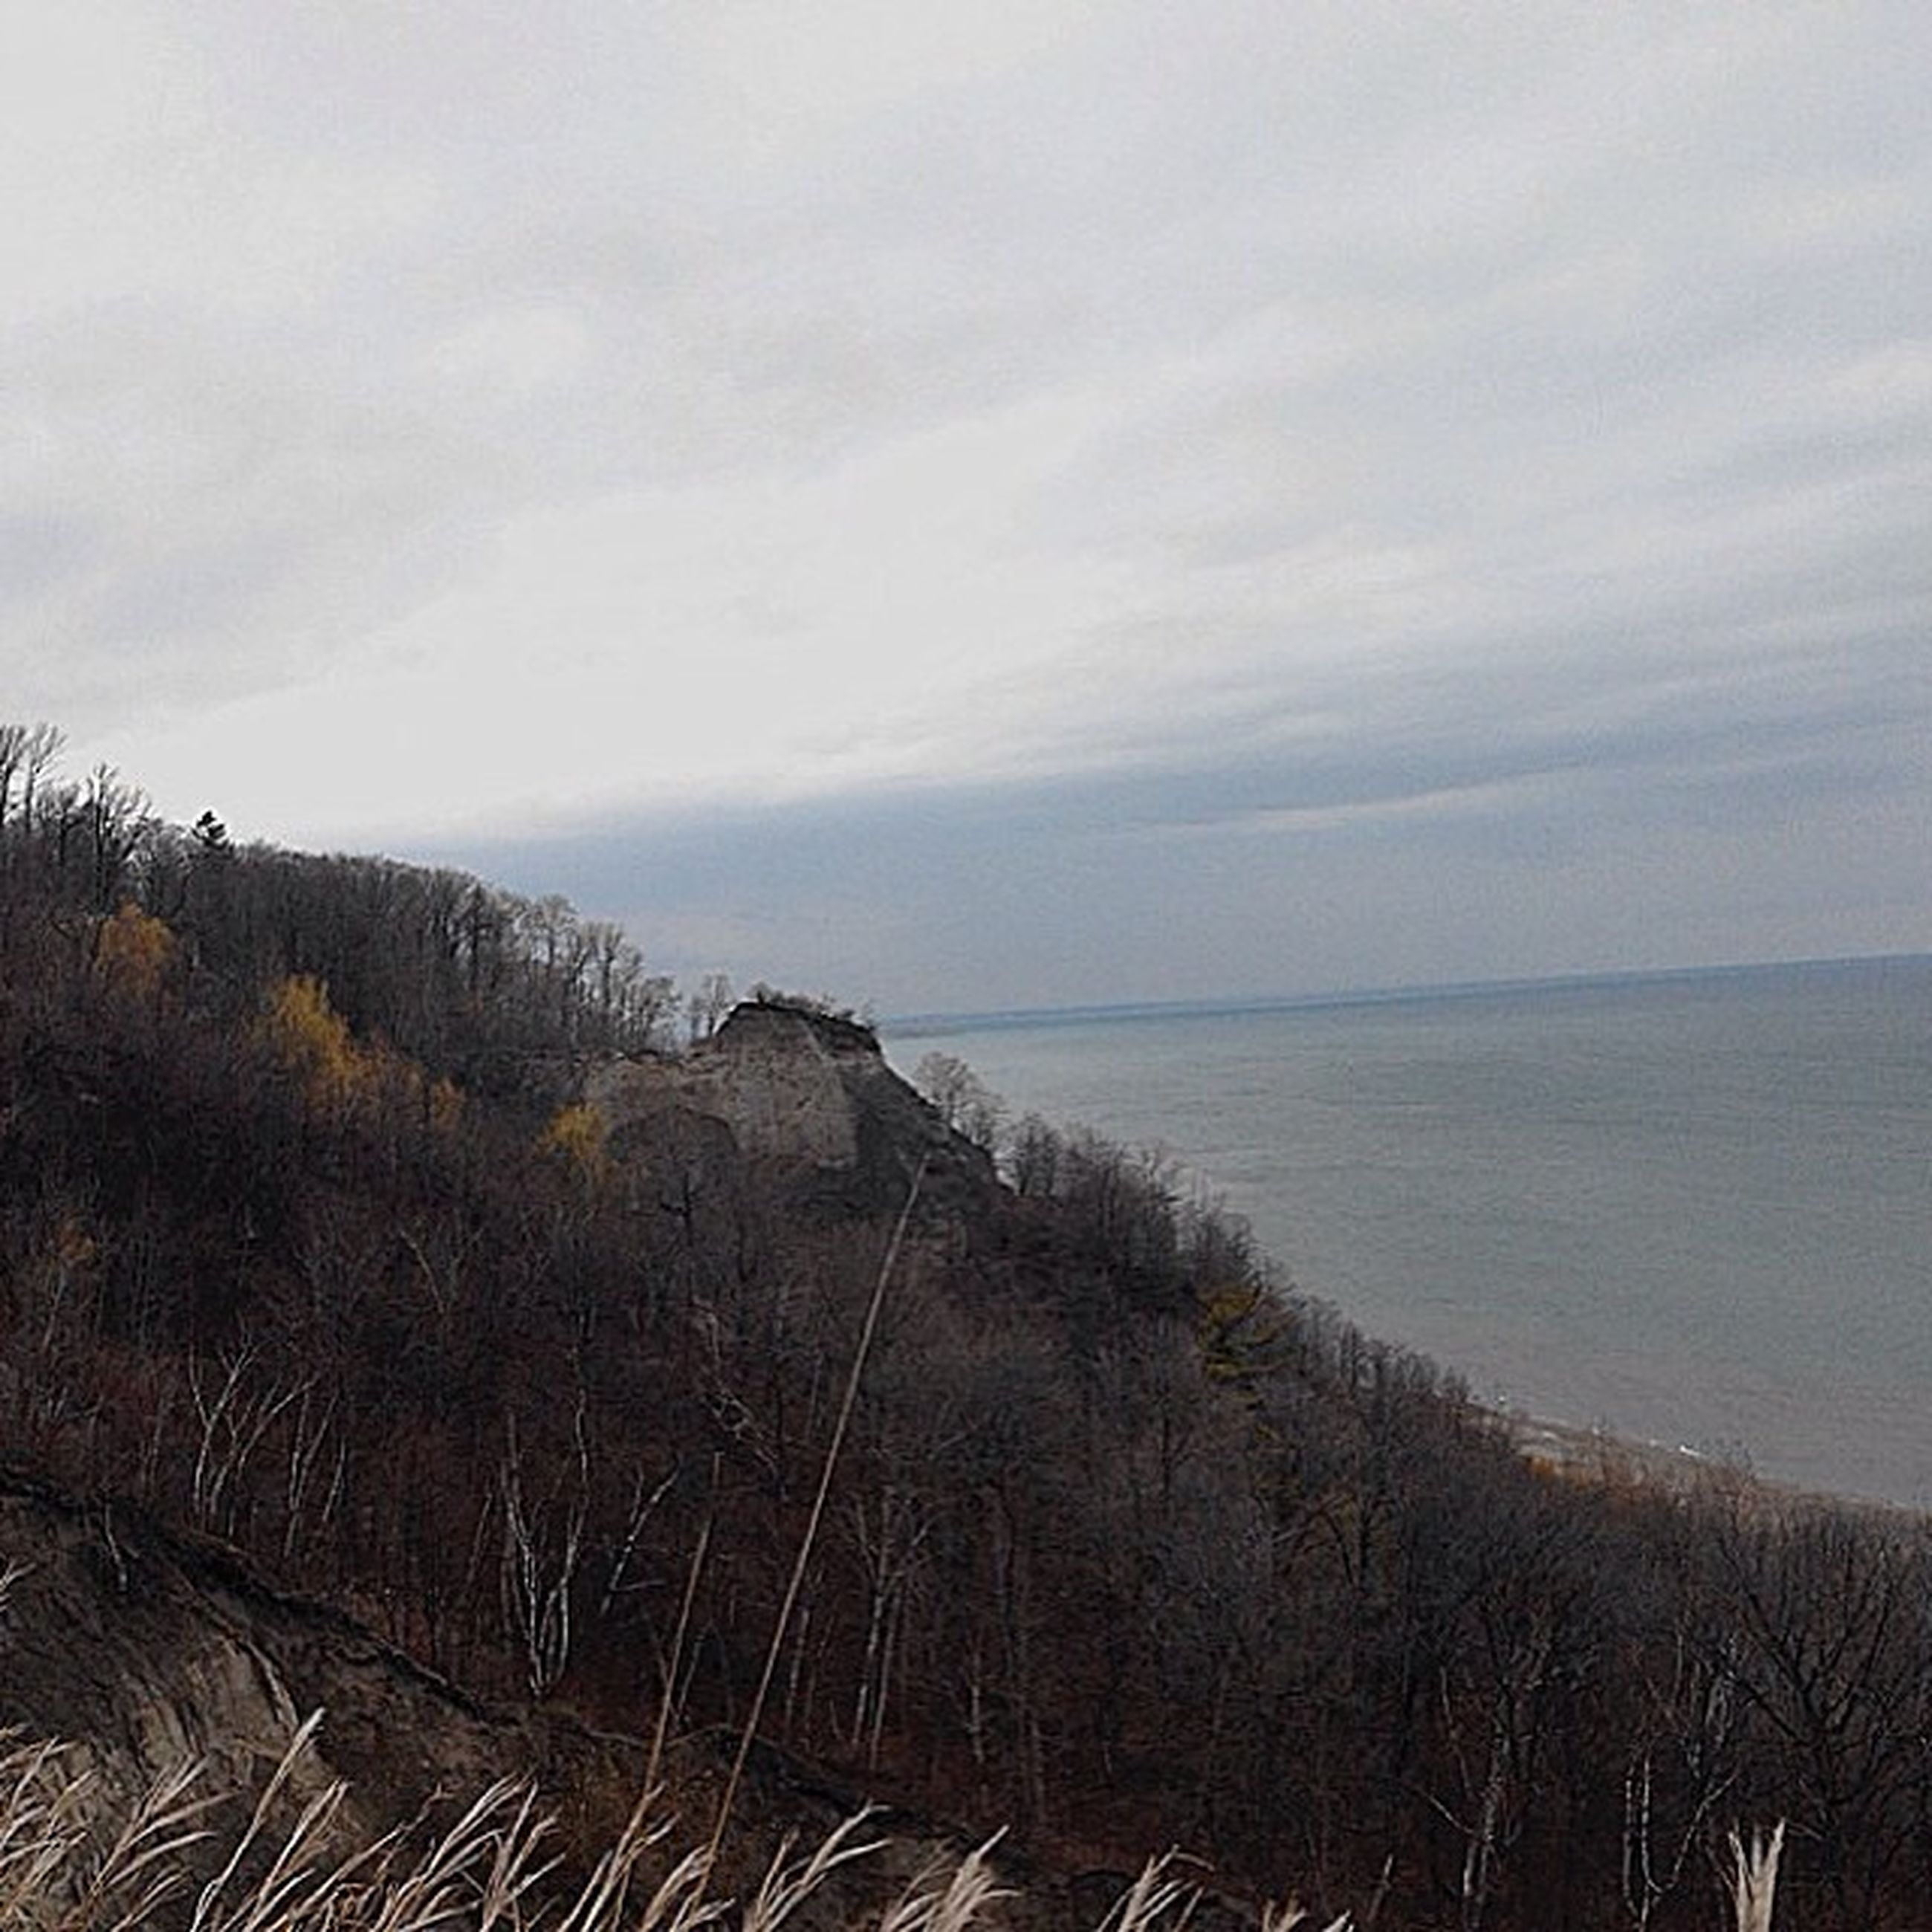 sea, water, tranquil scene, horizon over water, tranquility, scenics, sky, beach, beauty in nature, nature, shore, coastline, sand, idyllic, cloud - sky, remote, non-urban scene, day, high angle view, calm